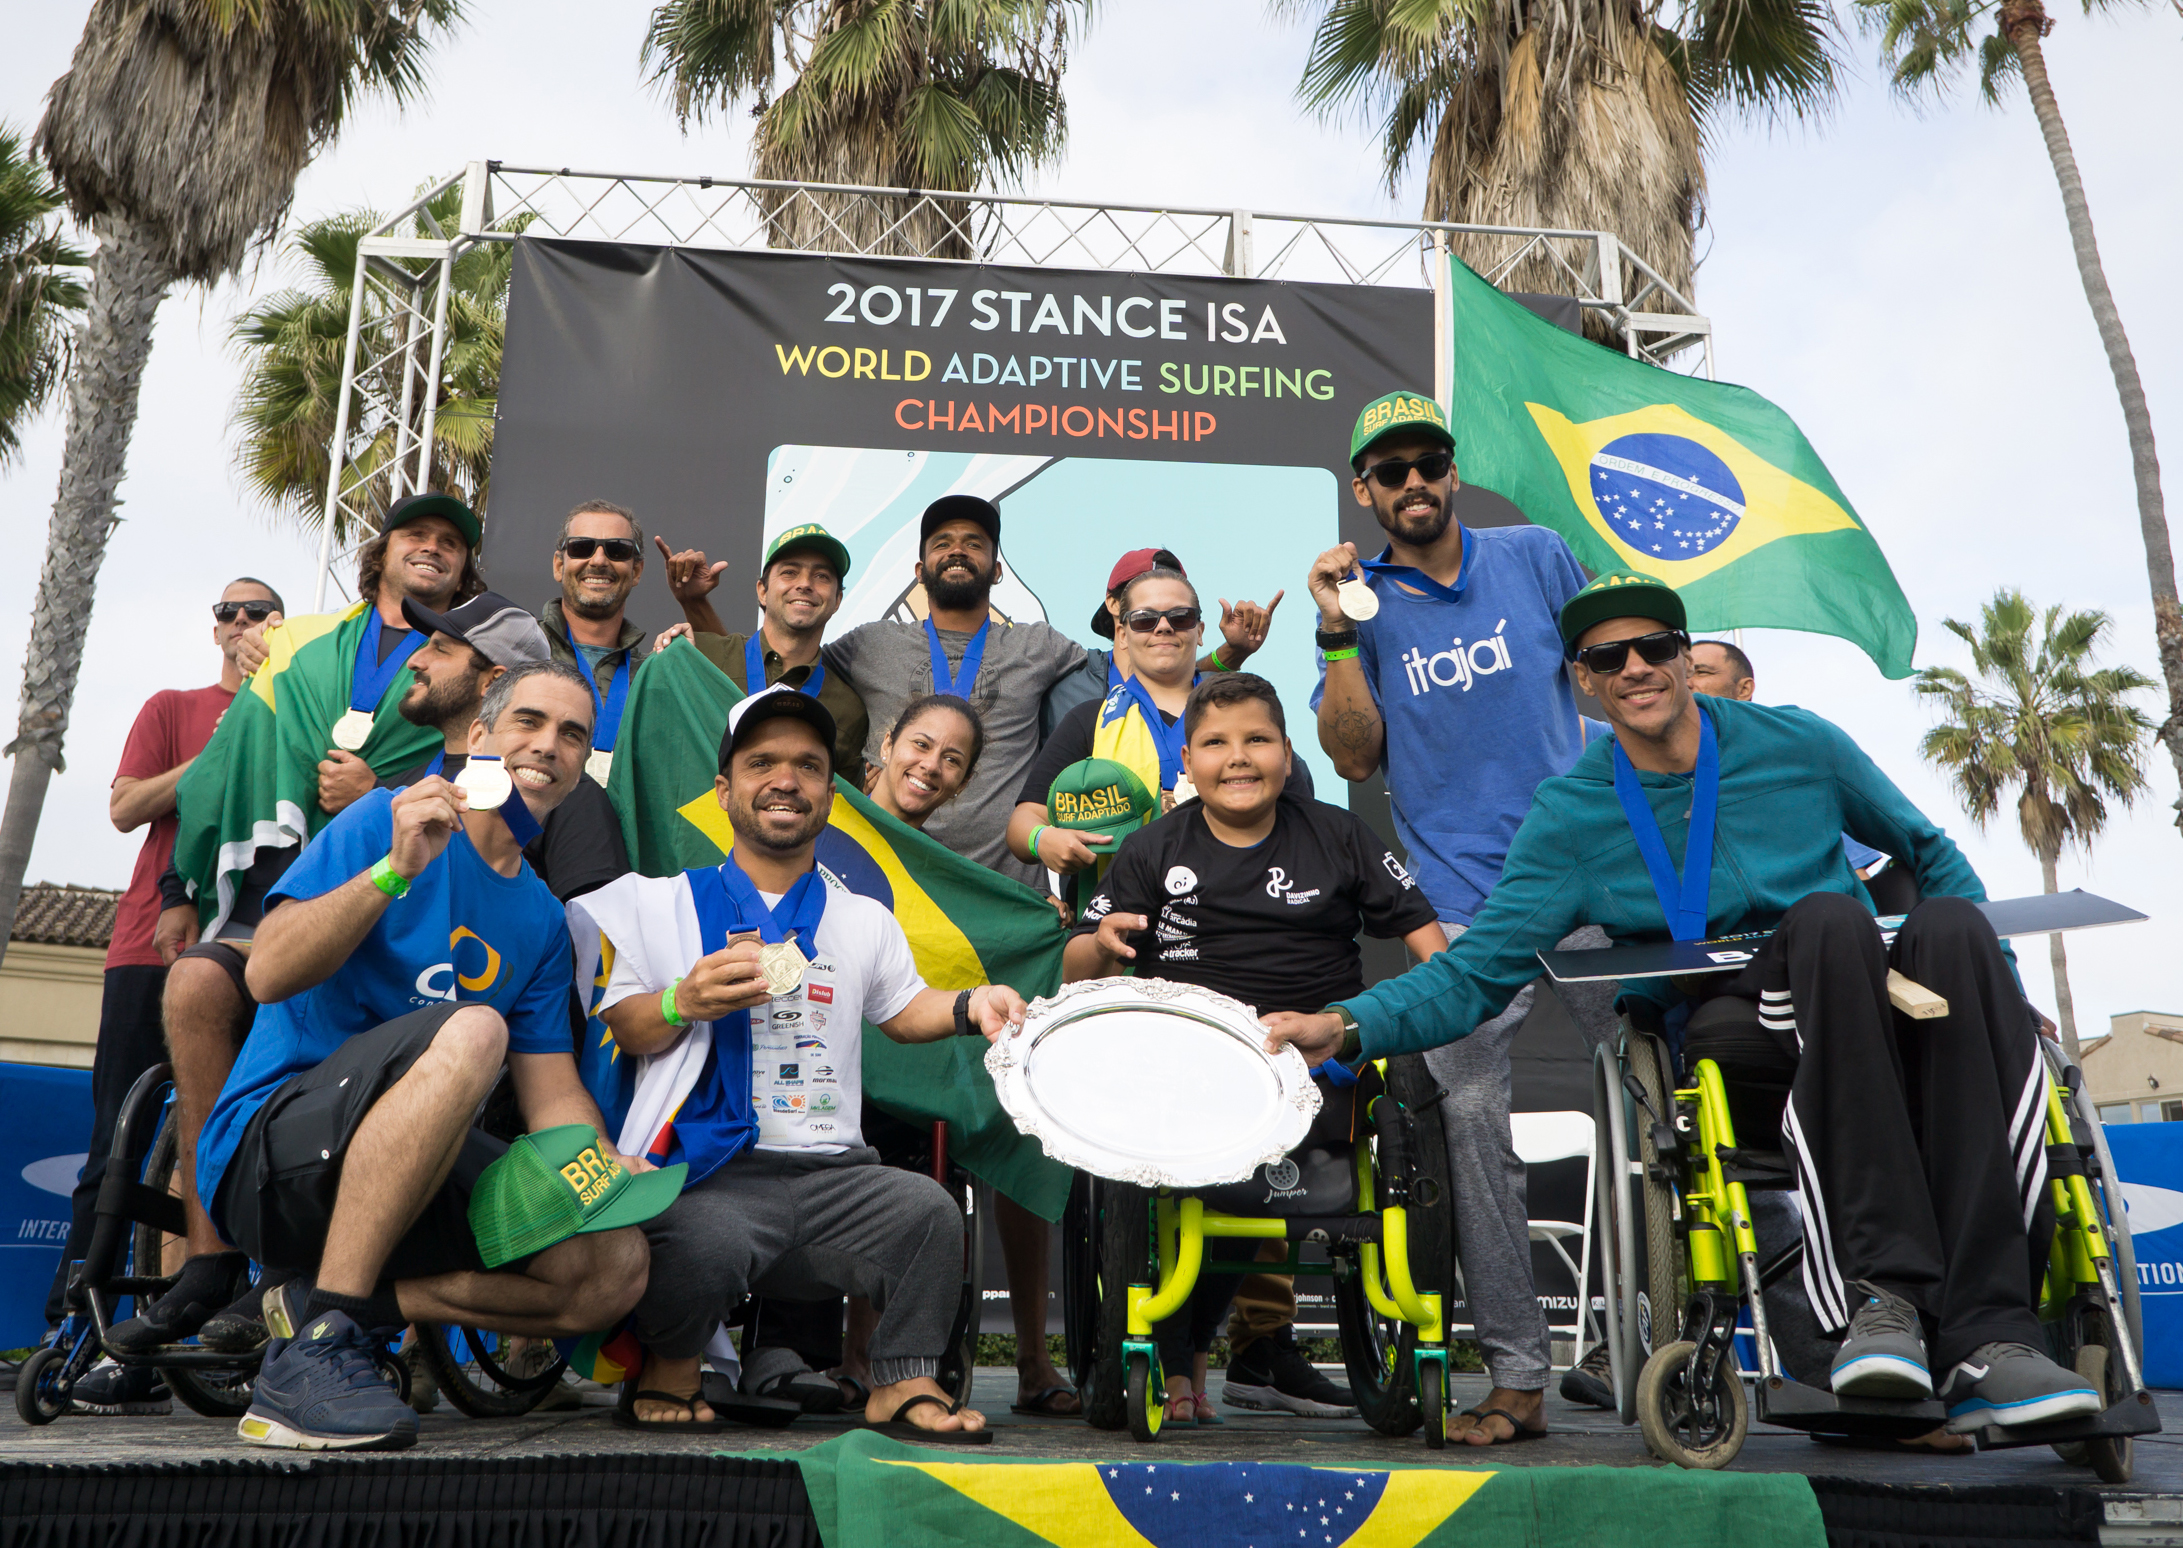 ISA World Adaptive Surfing Championship 2017